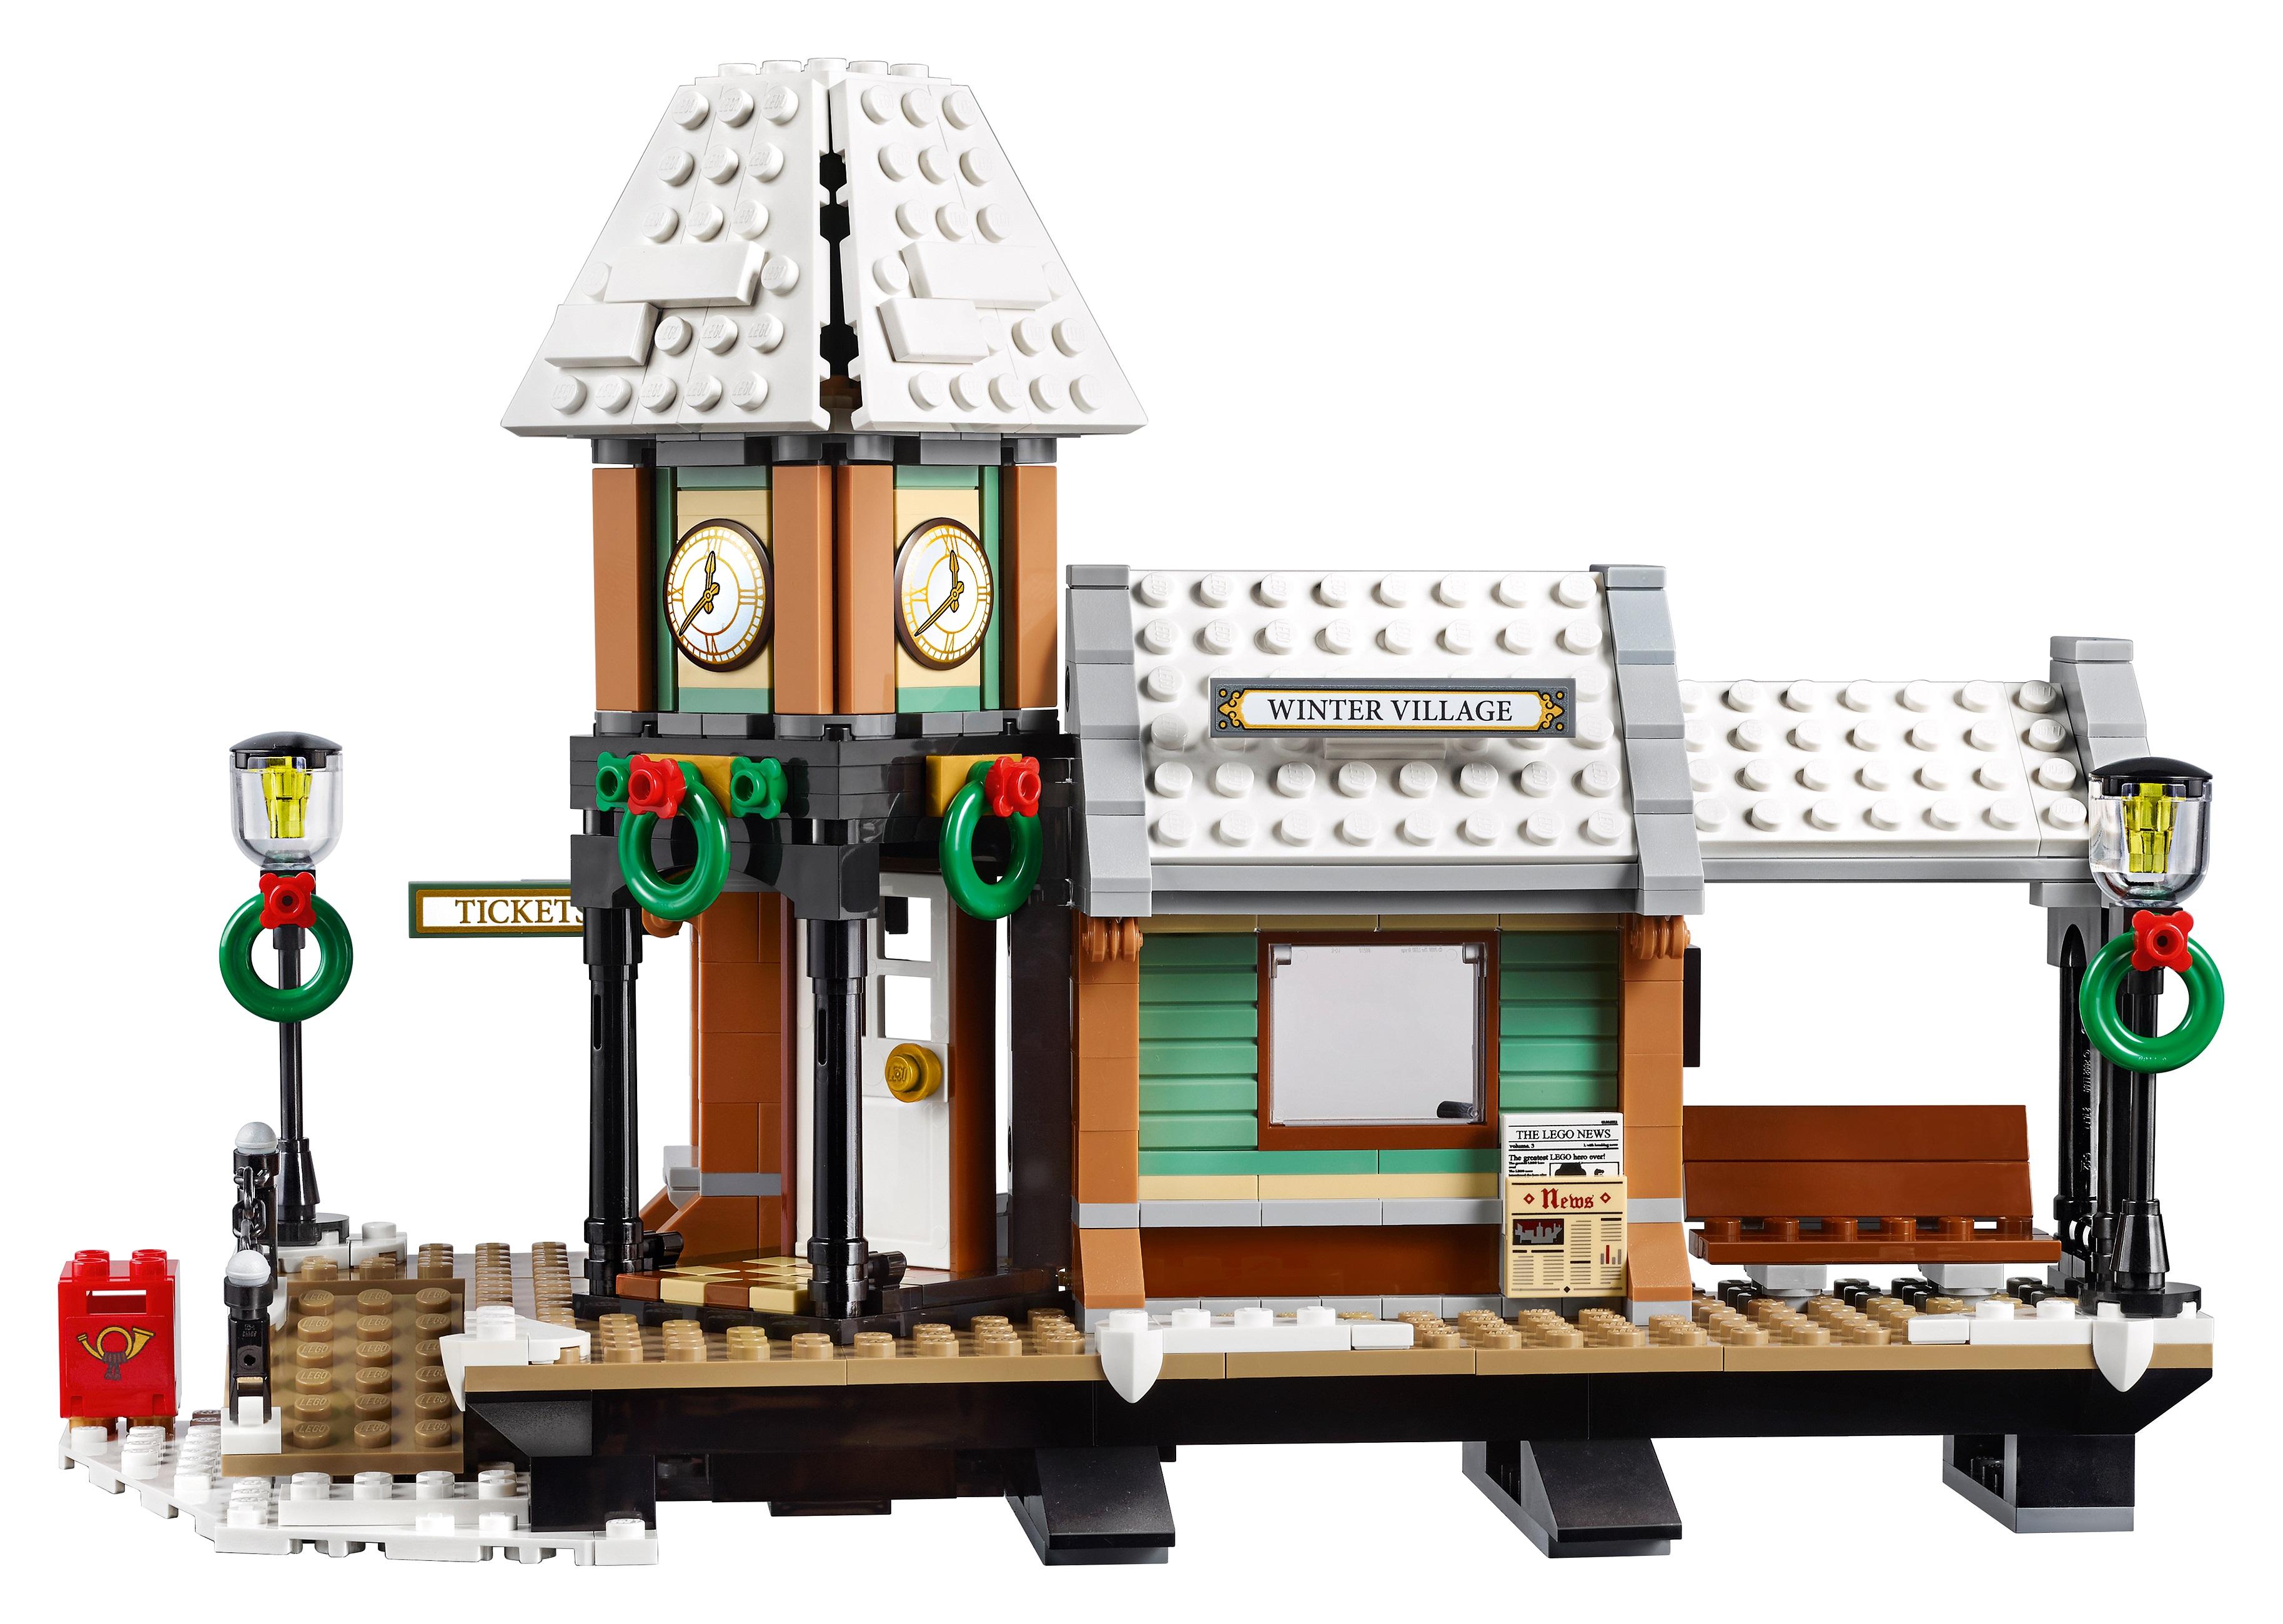 купить набор лего 10259 зимняя жд станция